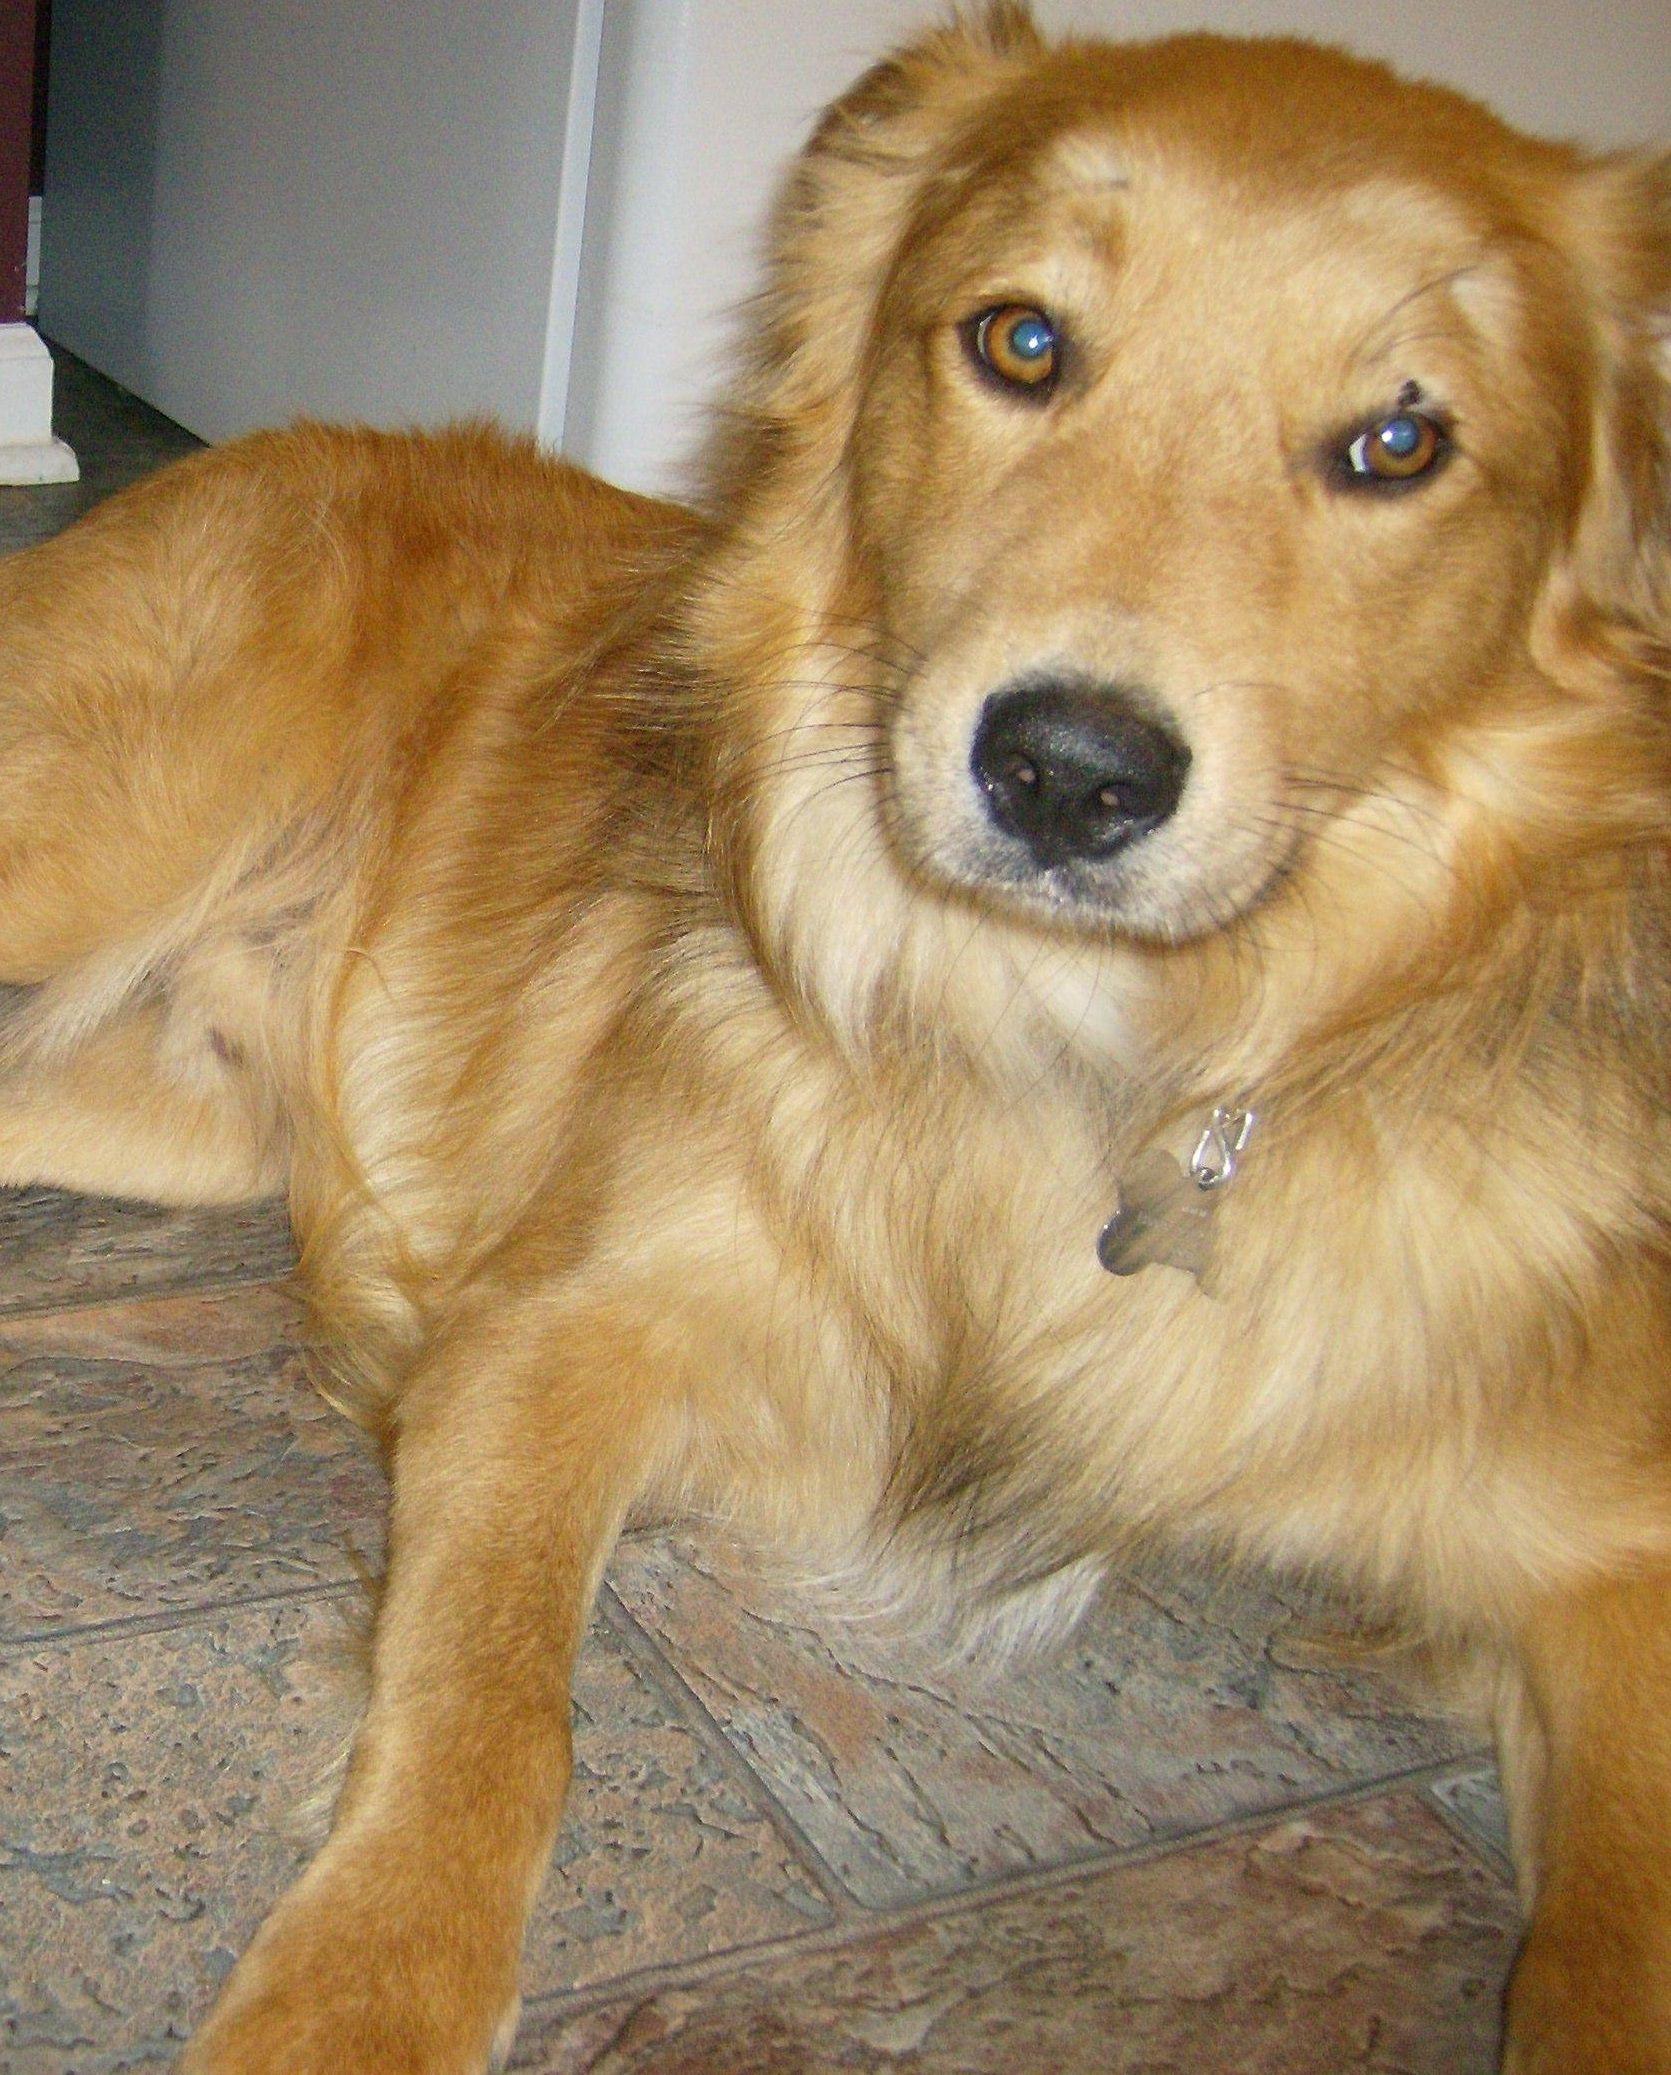 Golden Lab Shepherd Collie Puppy Mix By Teamworks Dog Training Neuse River Golden Retriever Rescue Golden Retriever Retriever Mix Golden Retriever Mix